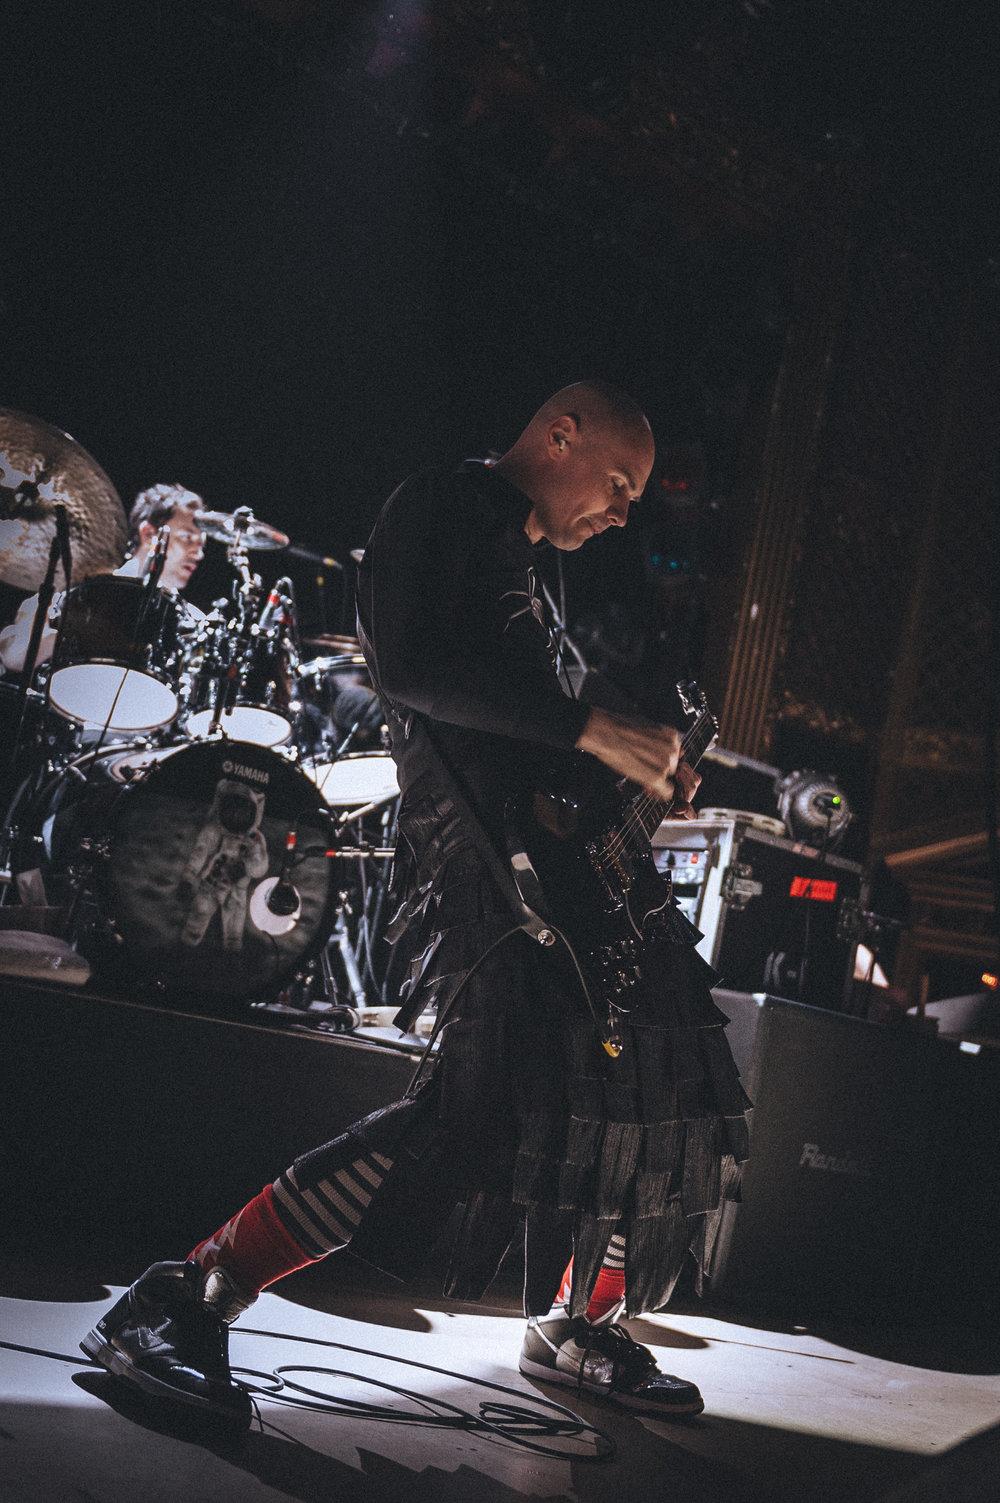 ChadFahnestockPhotography_Concert-040.jpg